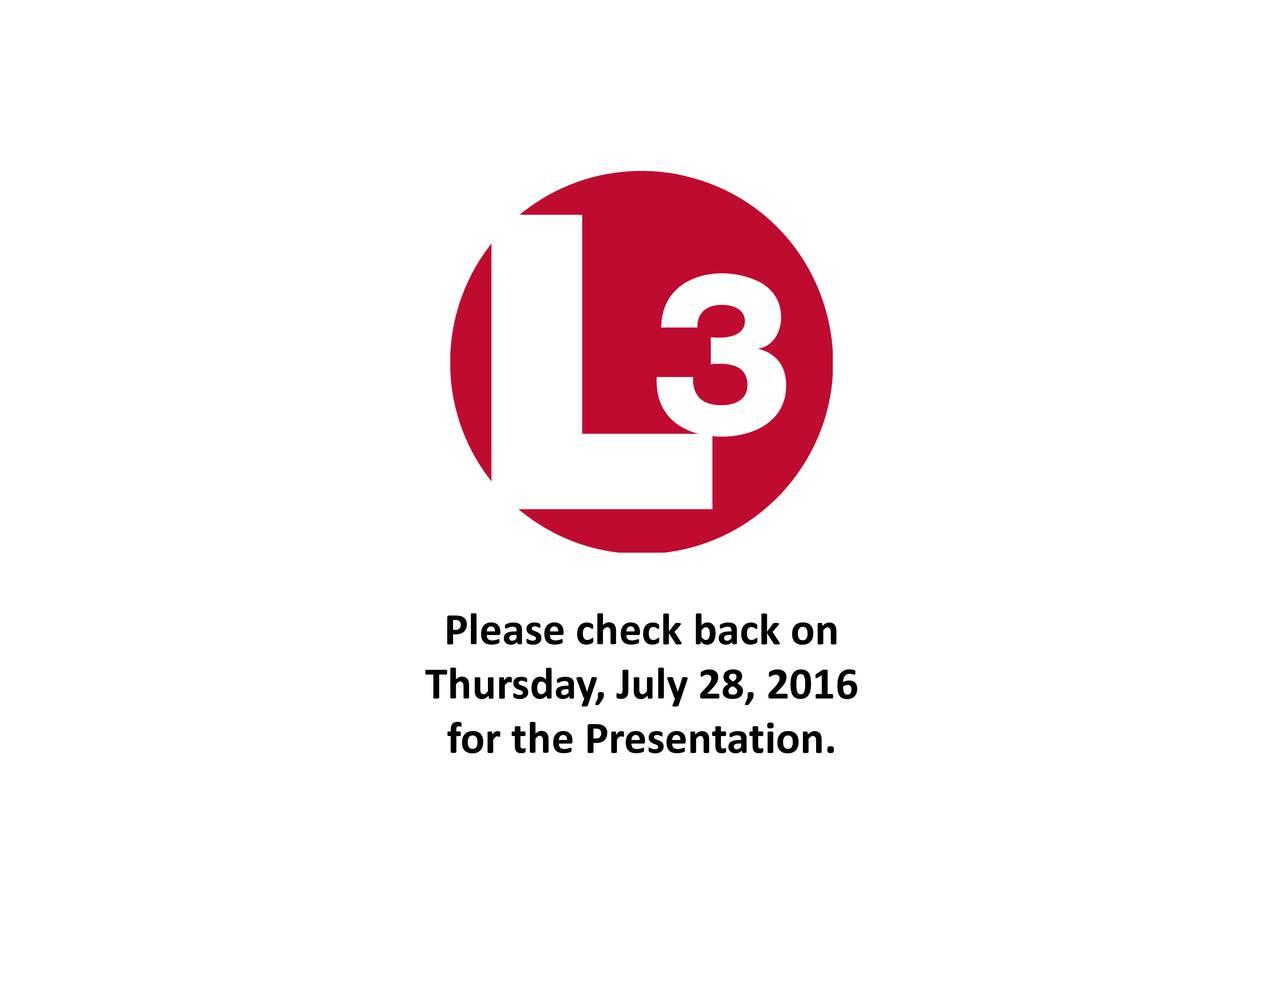 ac8, checklyresentation. he Please for Thursday,